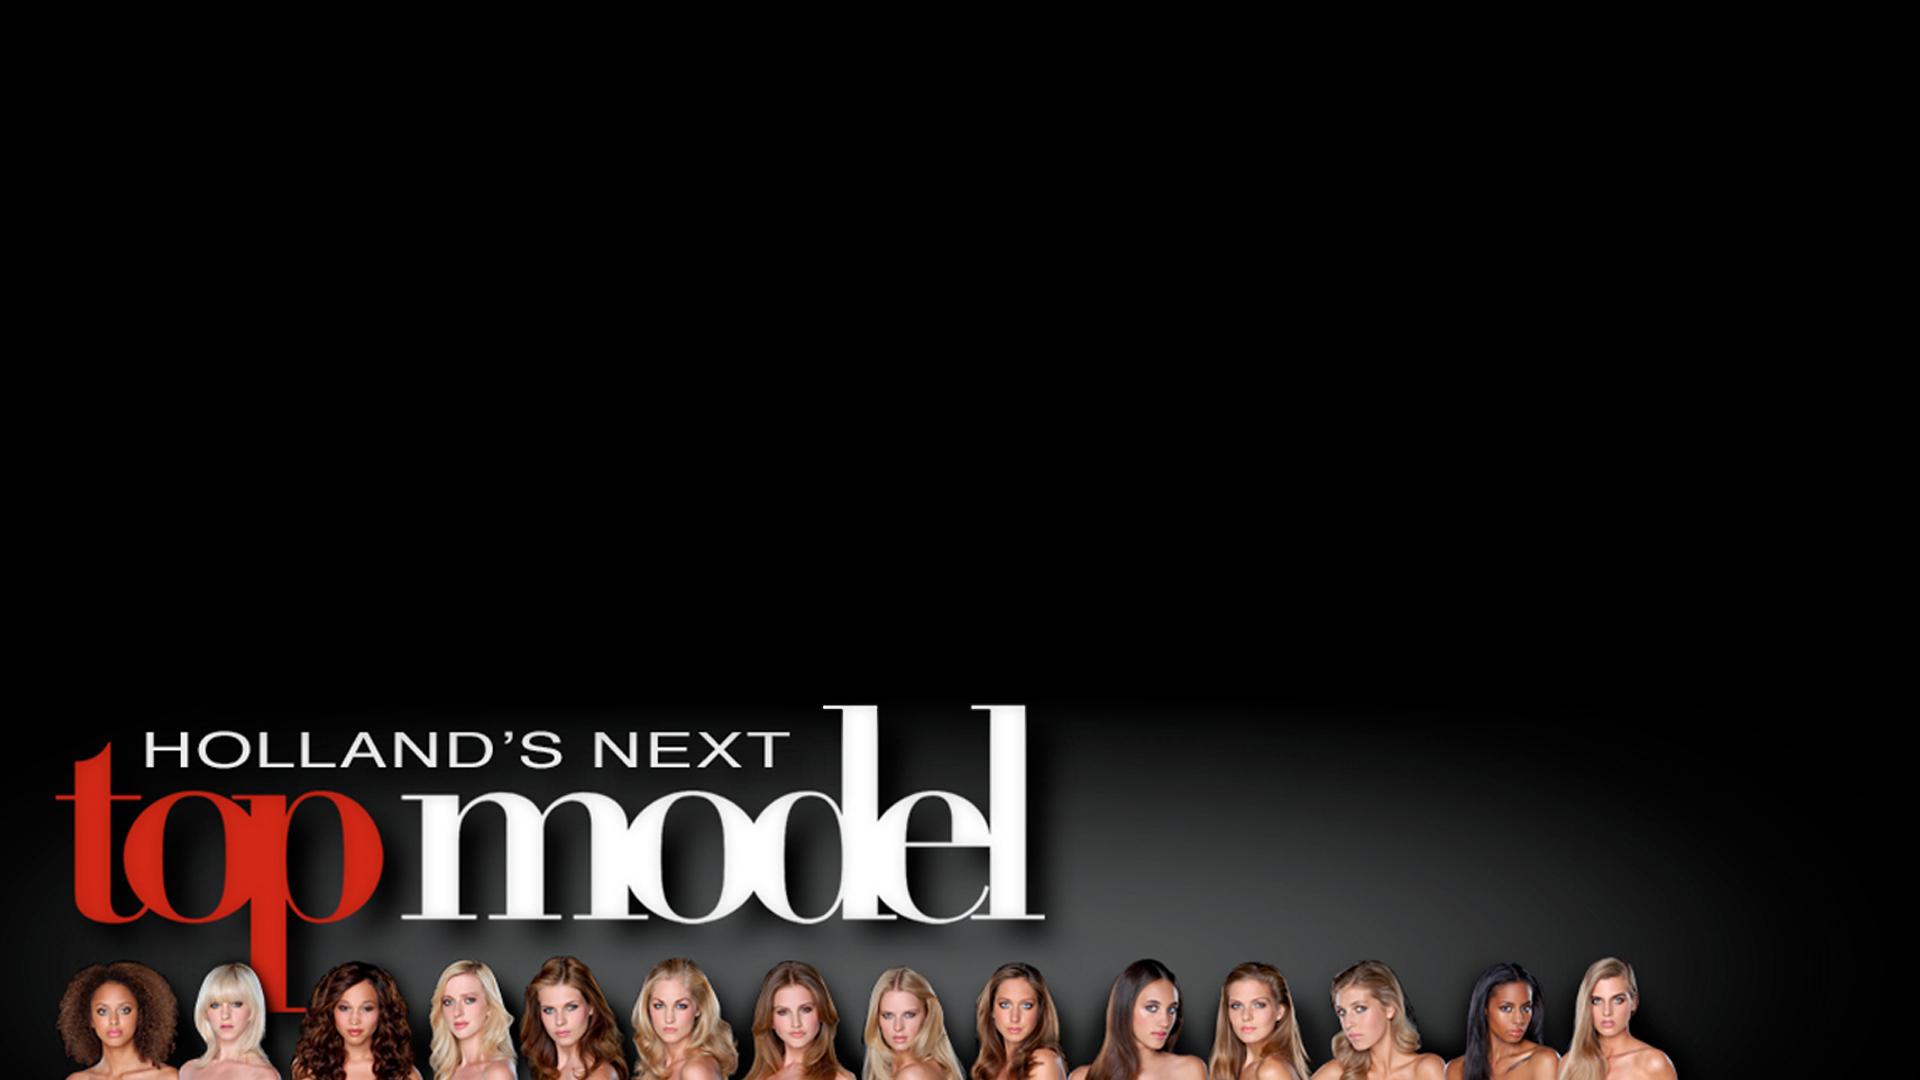 Holland's Next Top Model